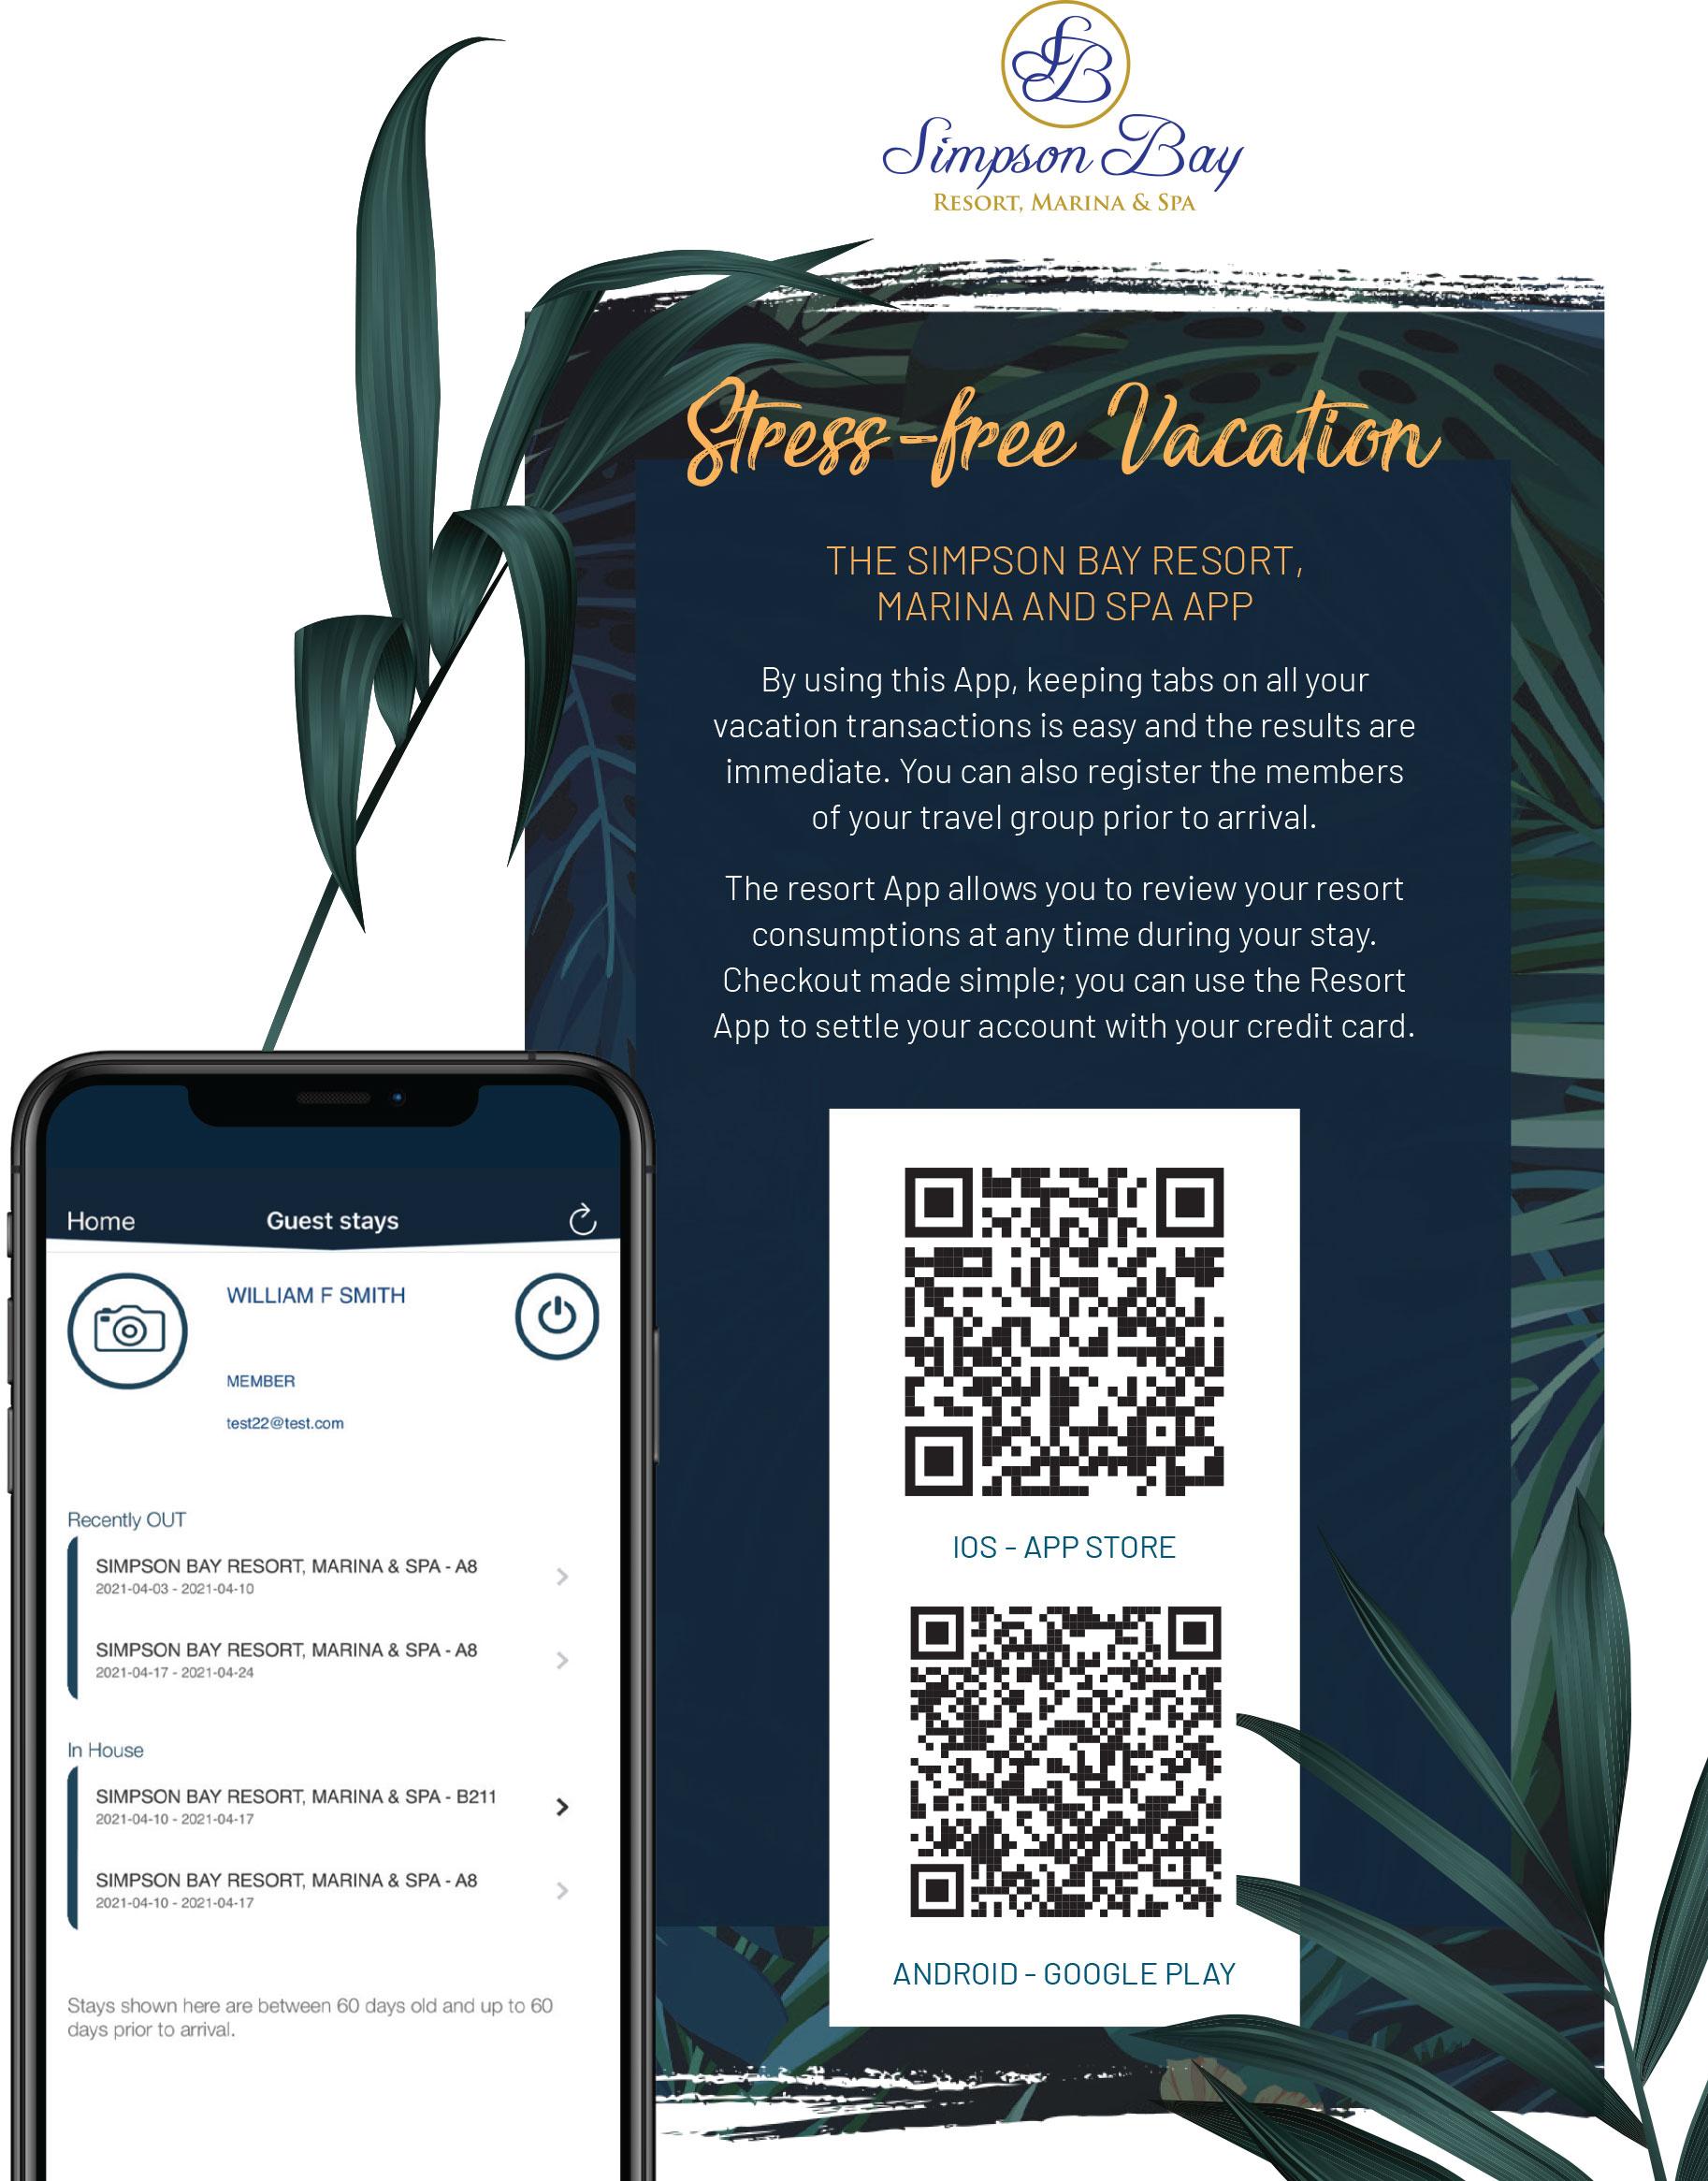 Simpson Bay Resort, Marina & Spa goes mobile